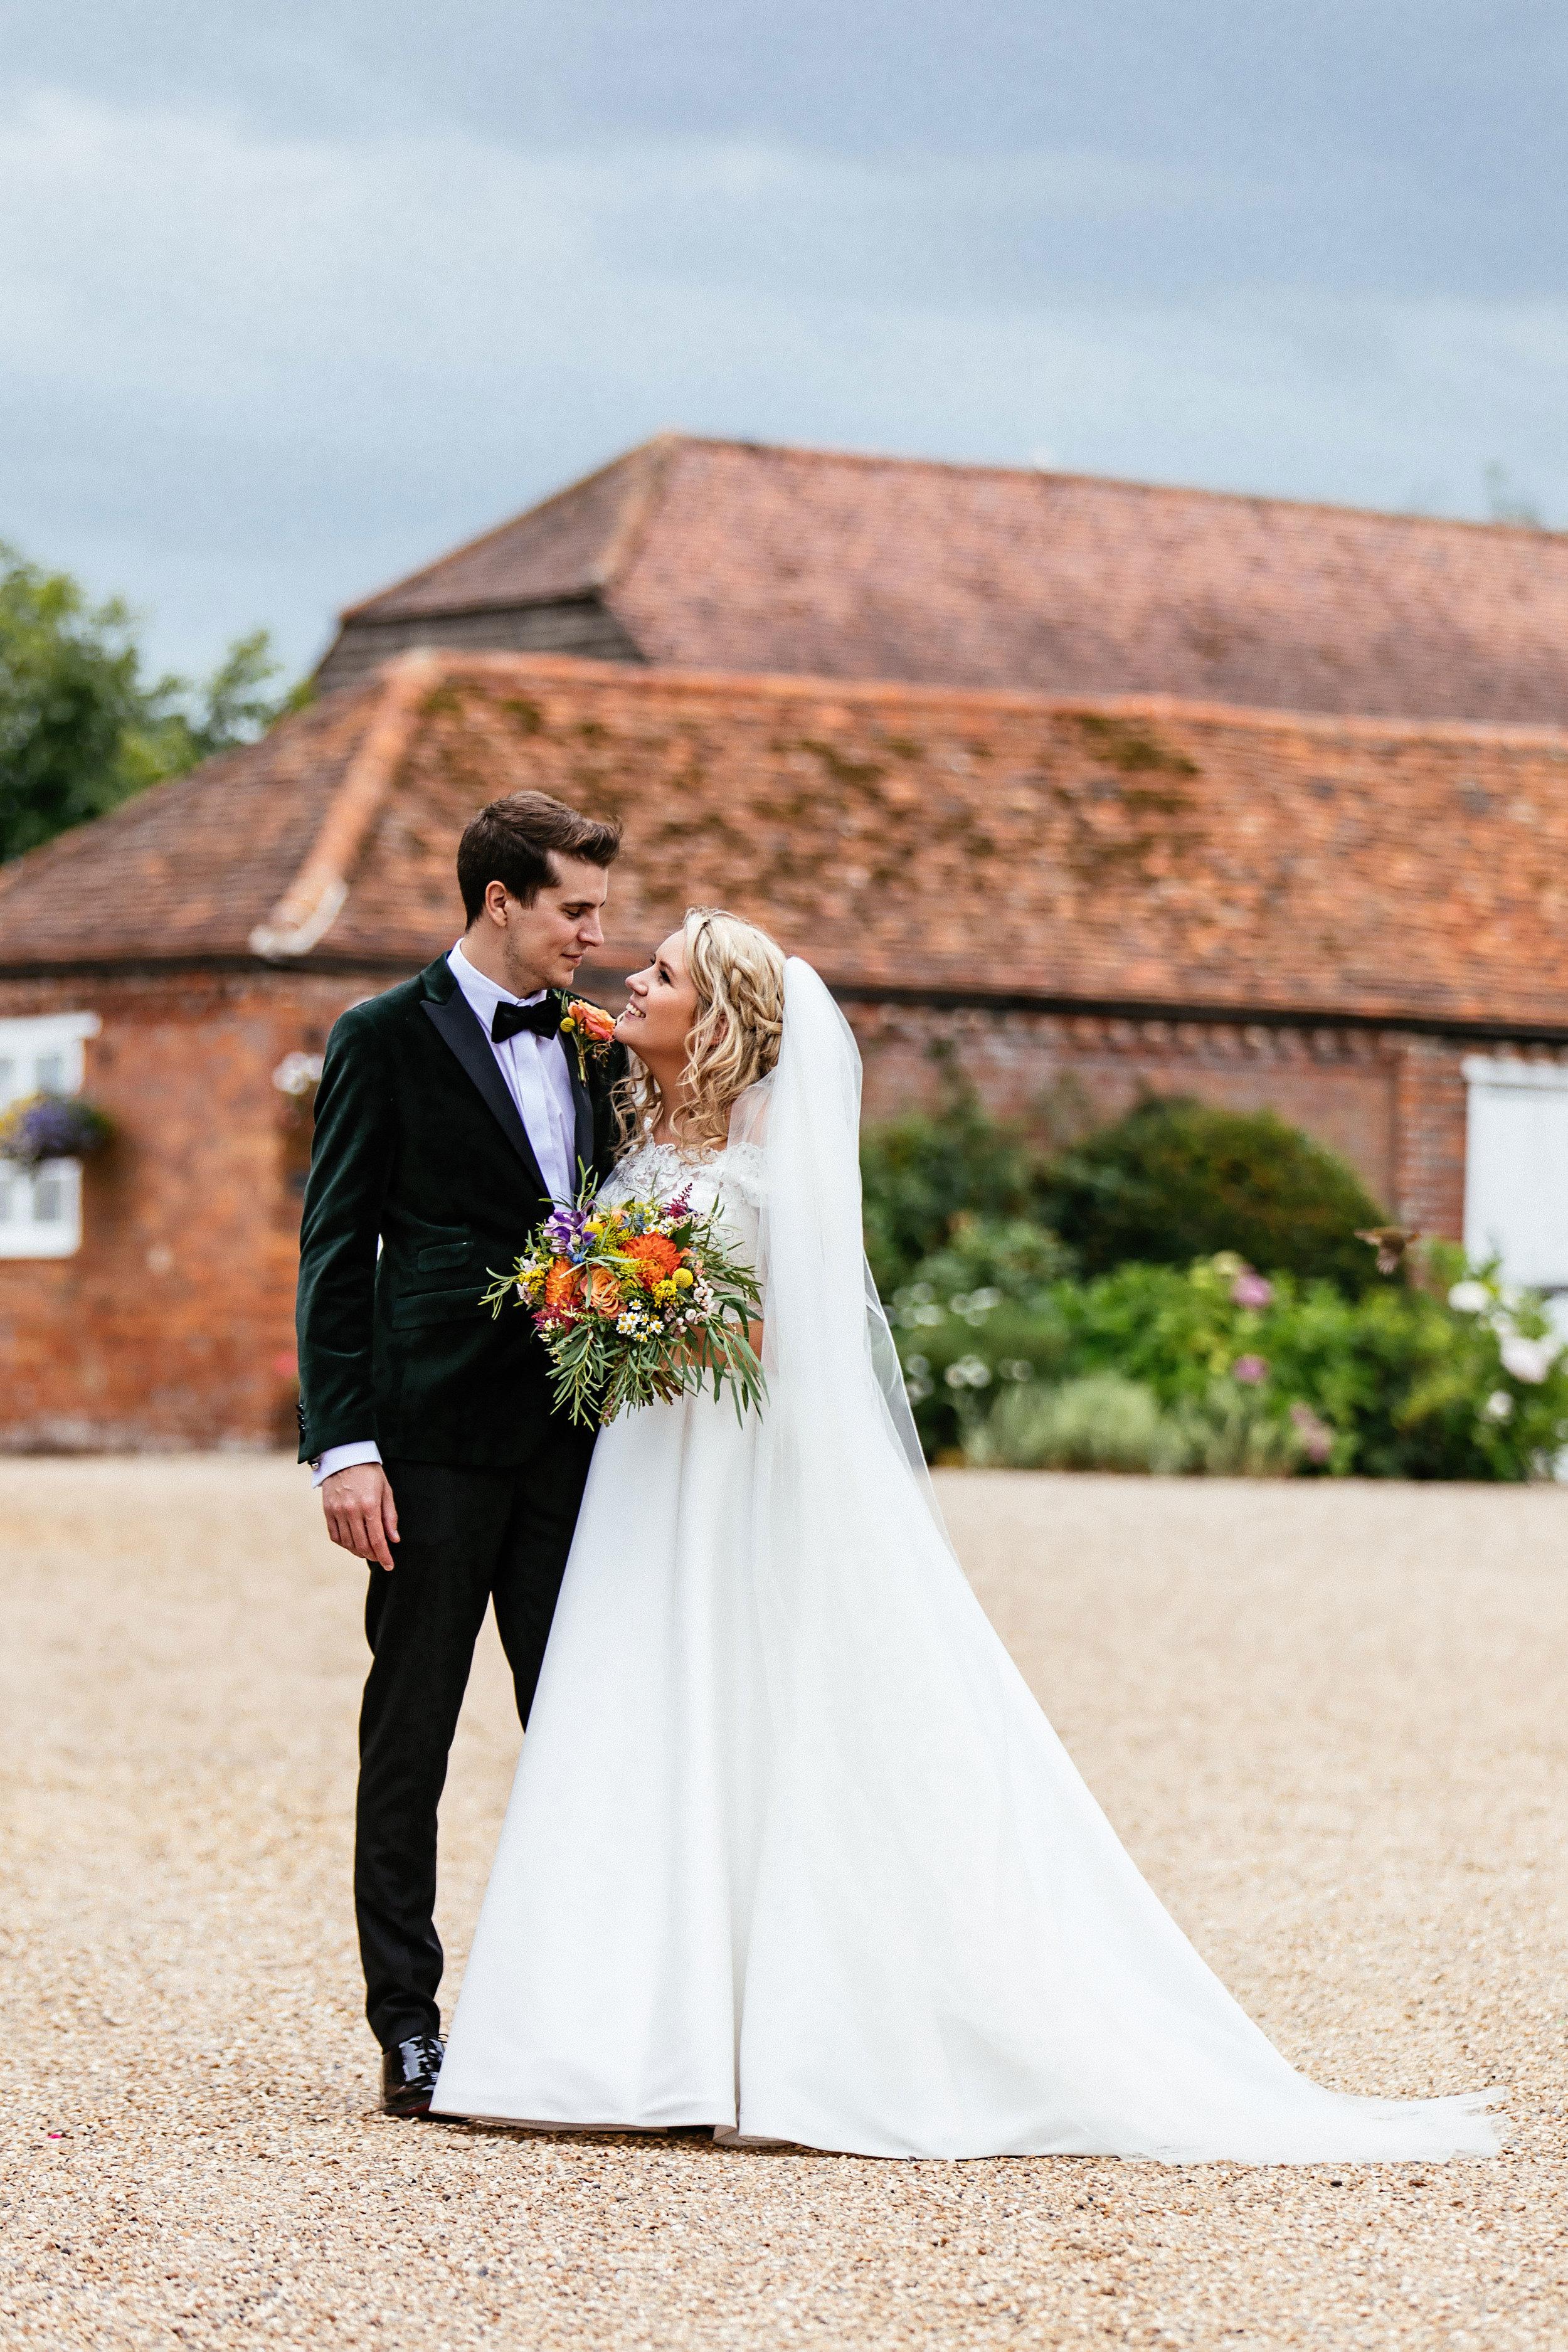 Tamara-and-Richard-Wedding-Highlights-46.jpg